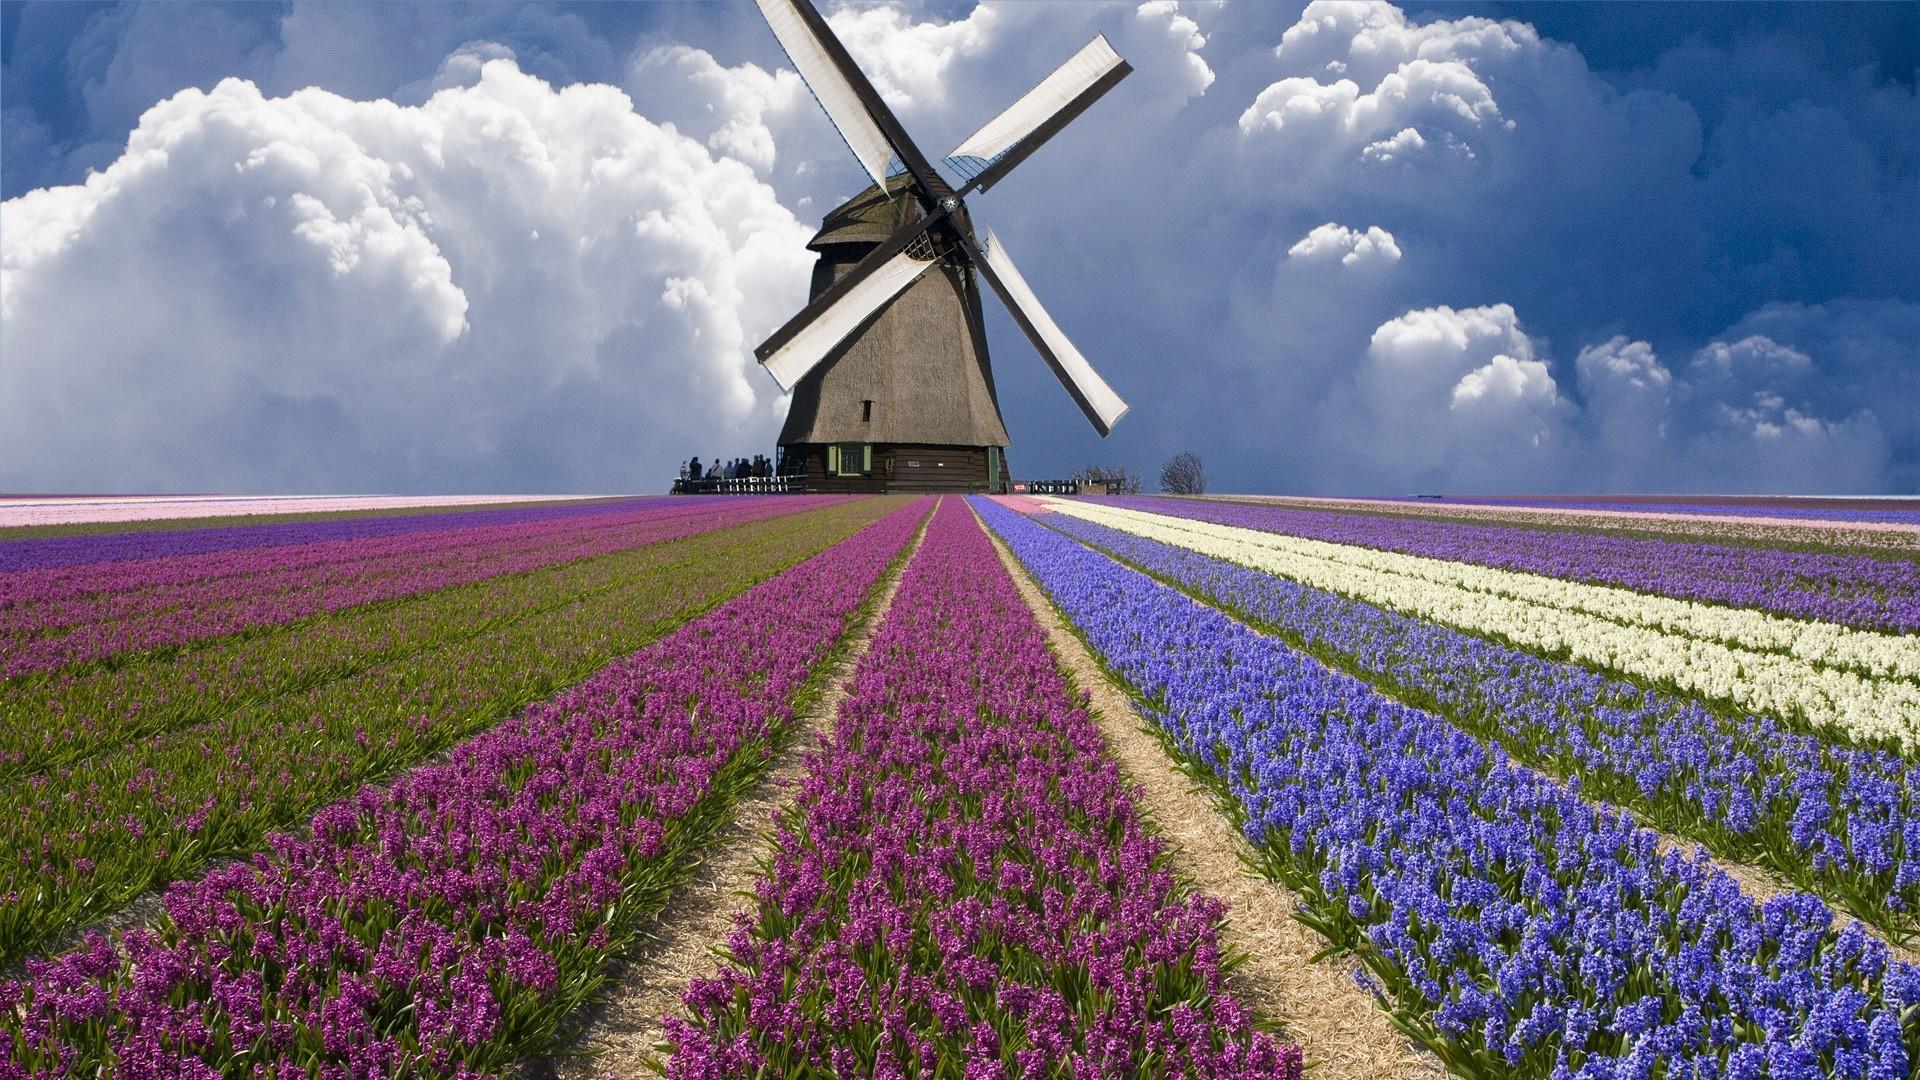 fond d'ecran gratuit moulin a vent